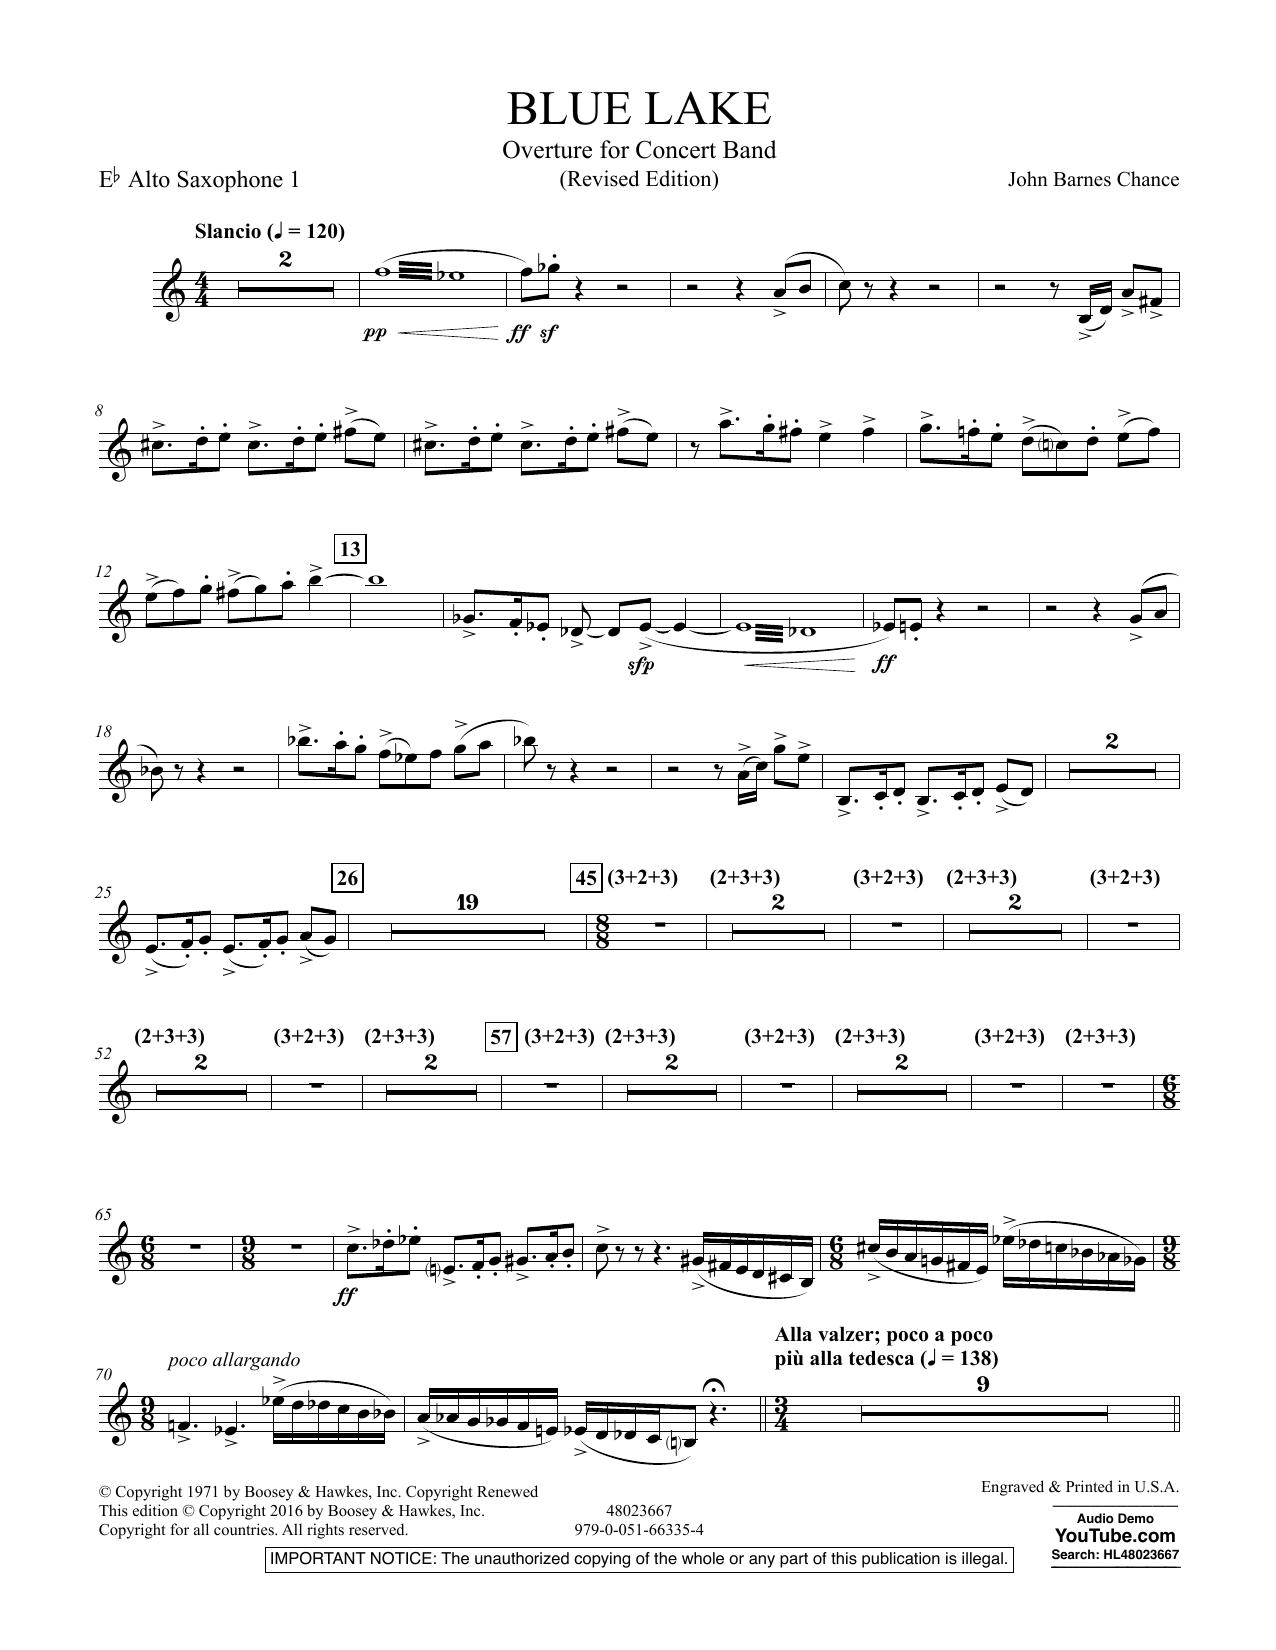 Blue Lake (Overture for Concert Band) - Eb Alto Saxophone 1 (Concert Band)